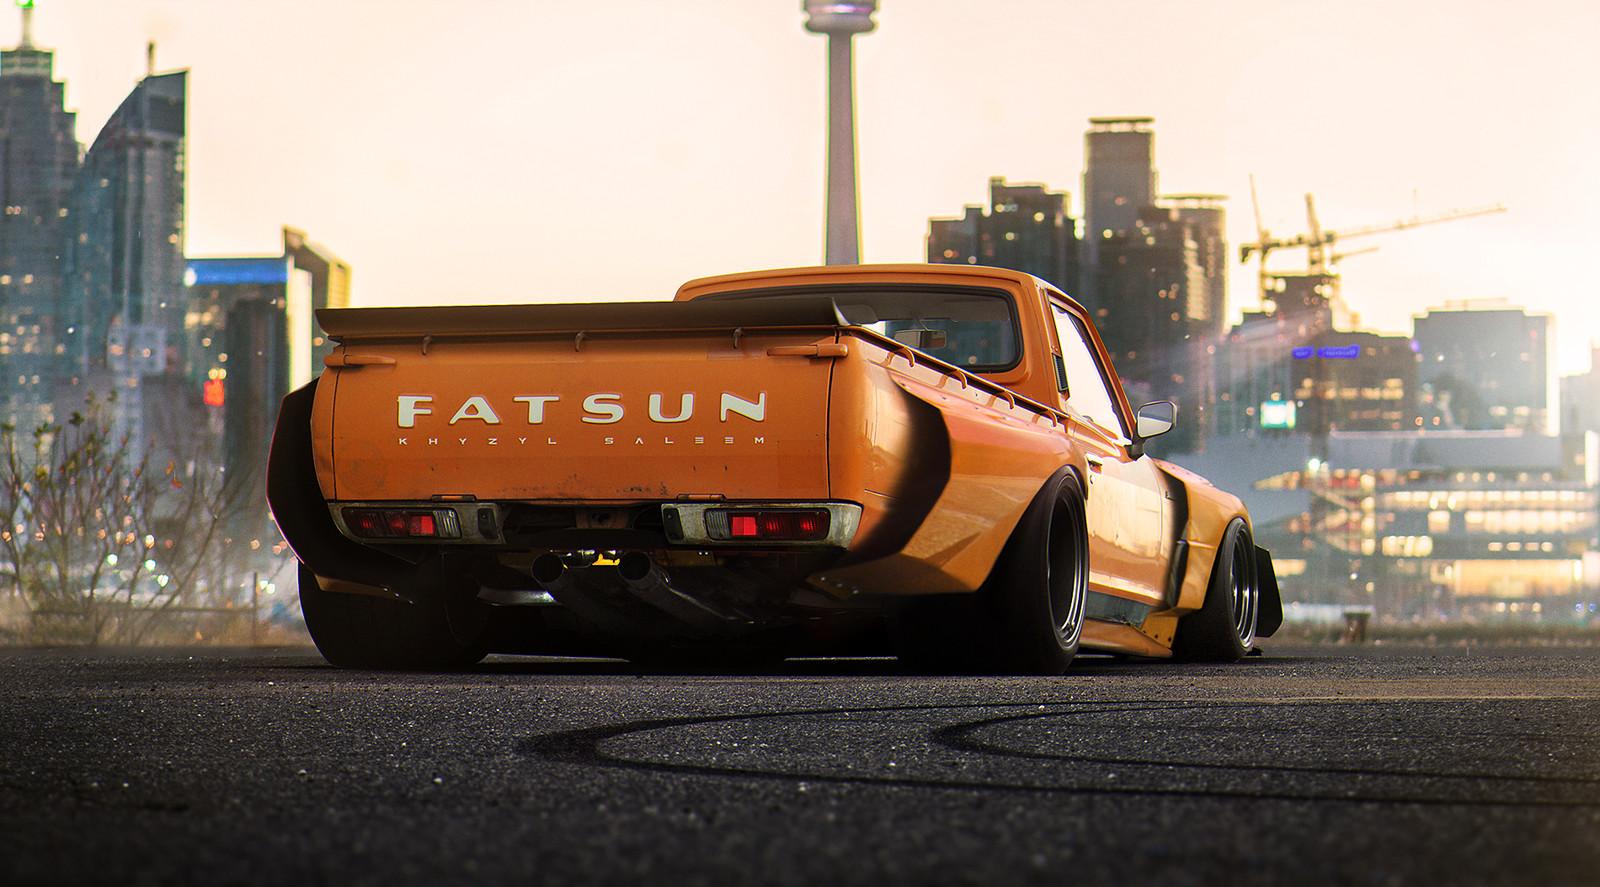 FATSUN